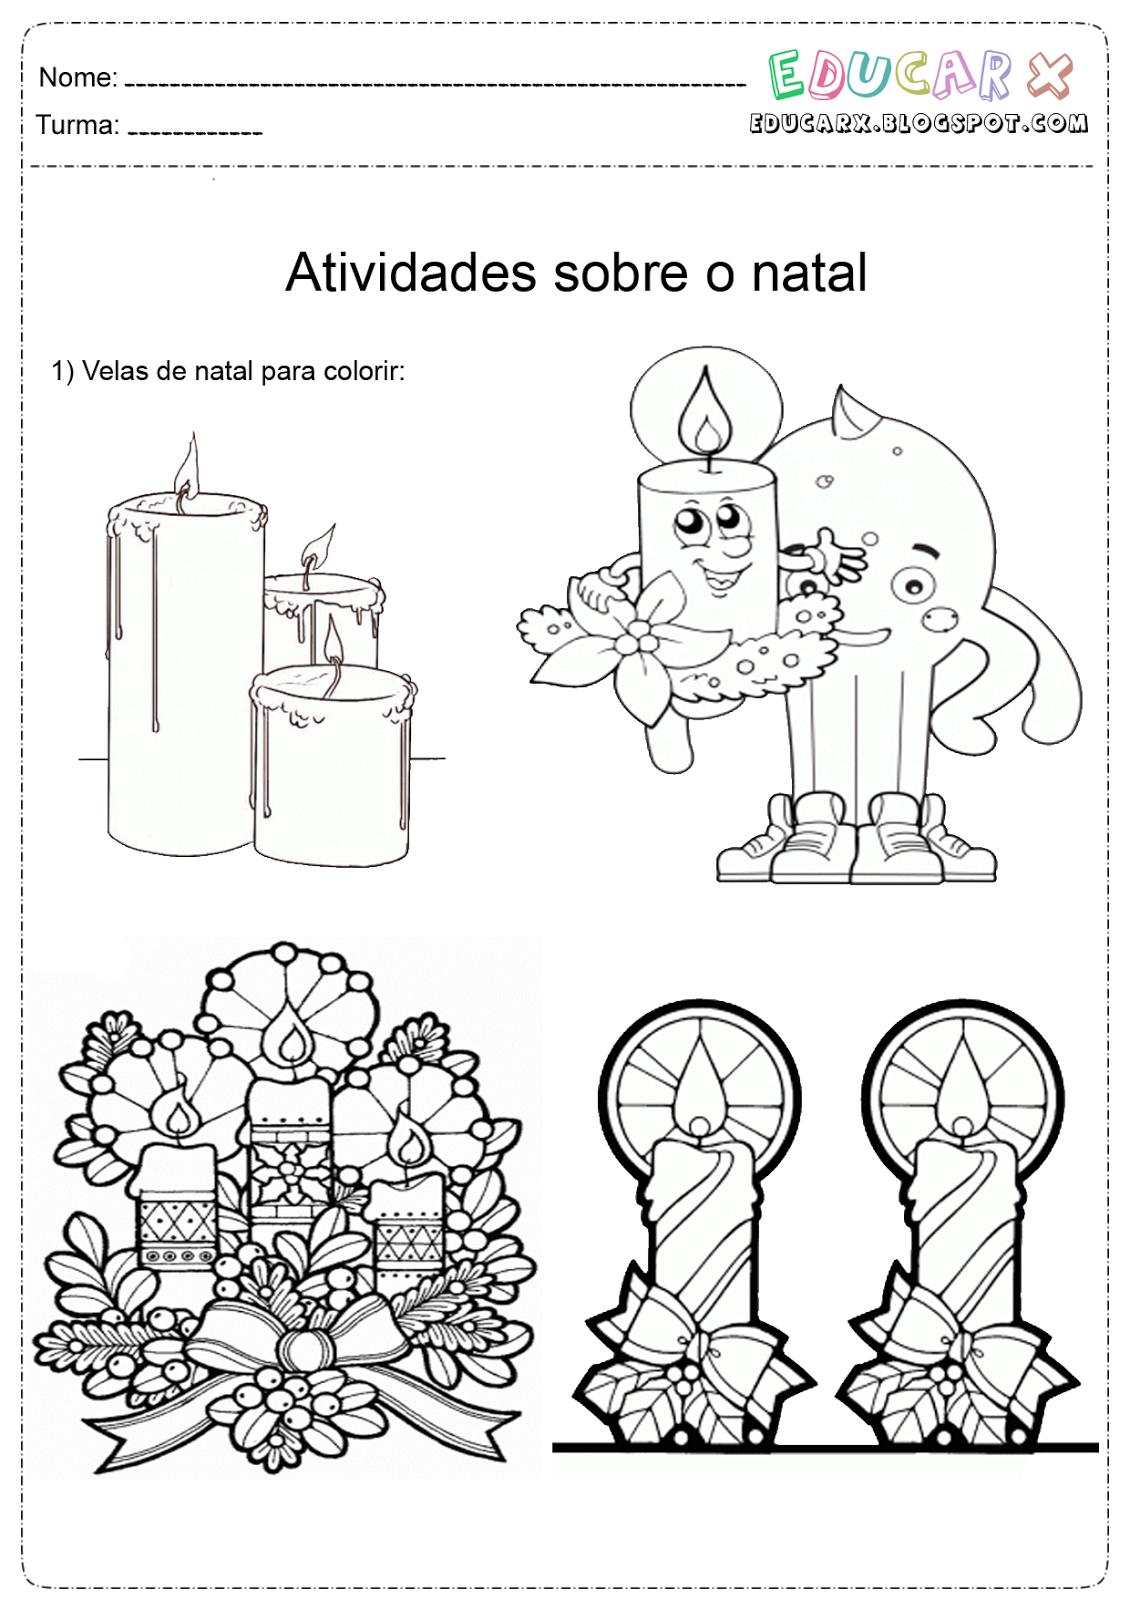 Educar X Velas De Natal Para Colorir E Imprimir